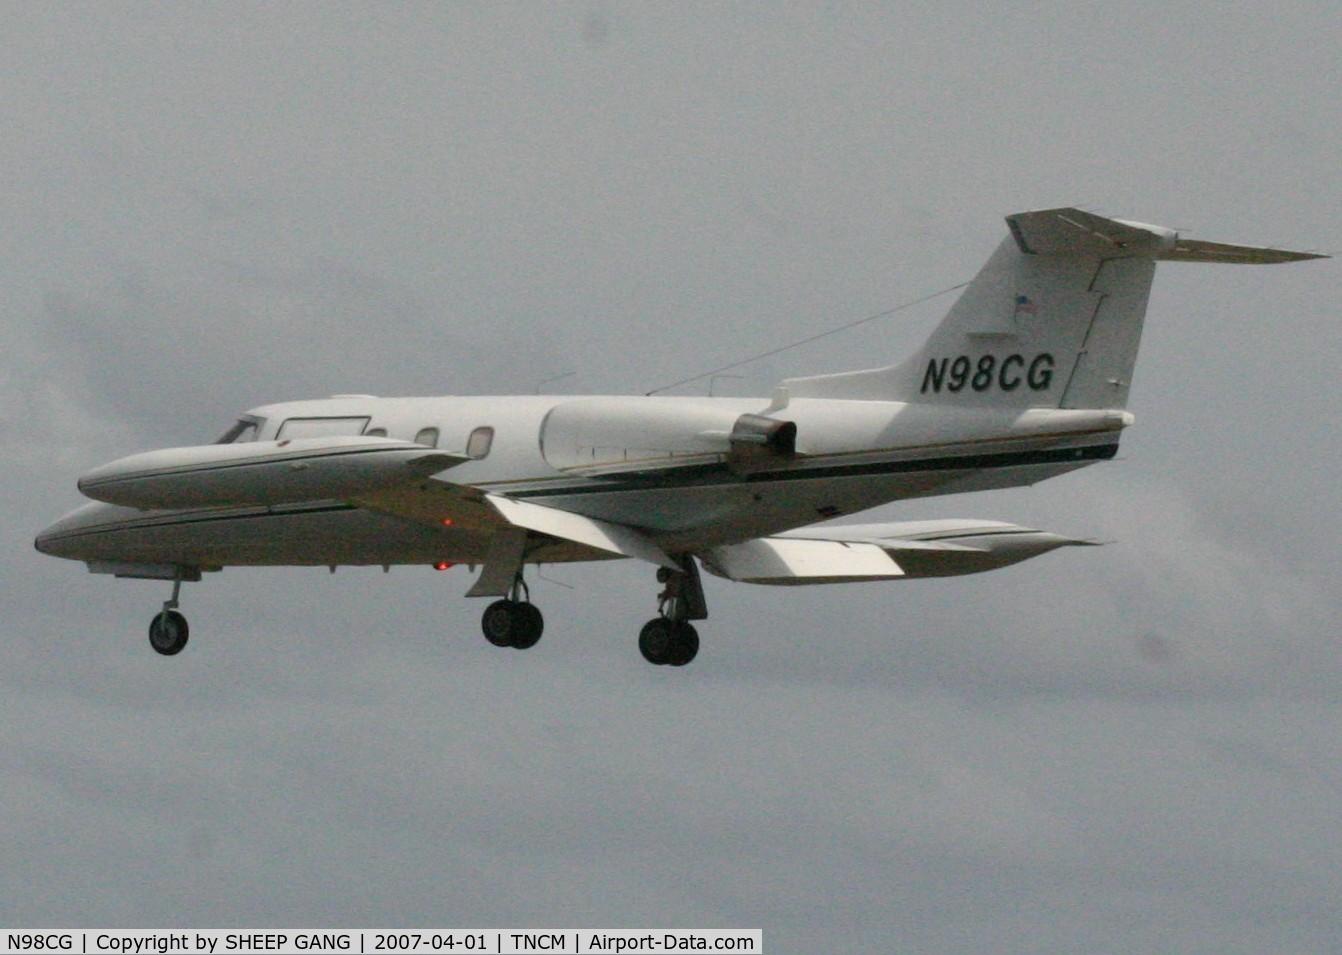 N98CG, 1976 Learjet 24D C/N 289, Landing at tncm